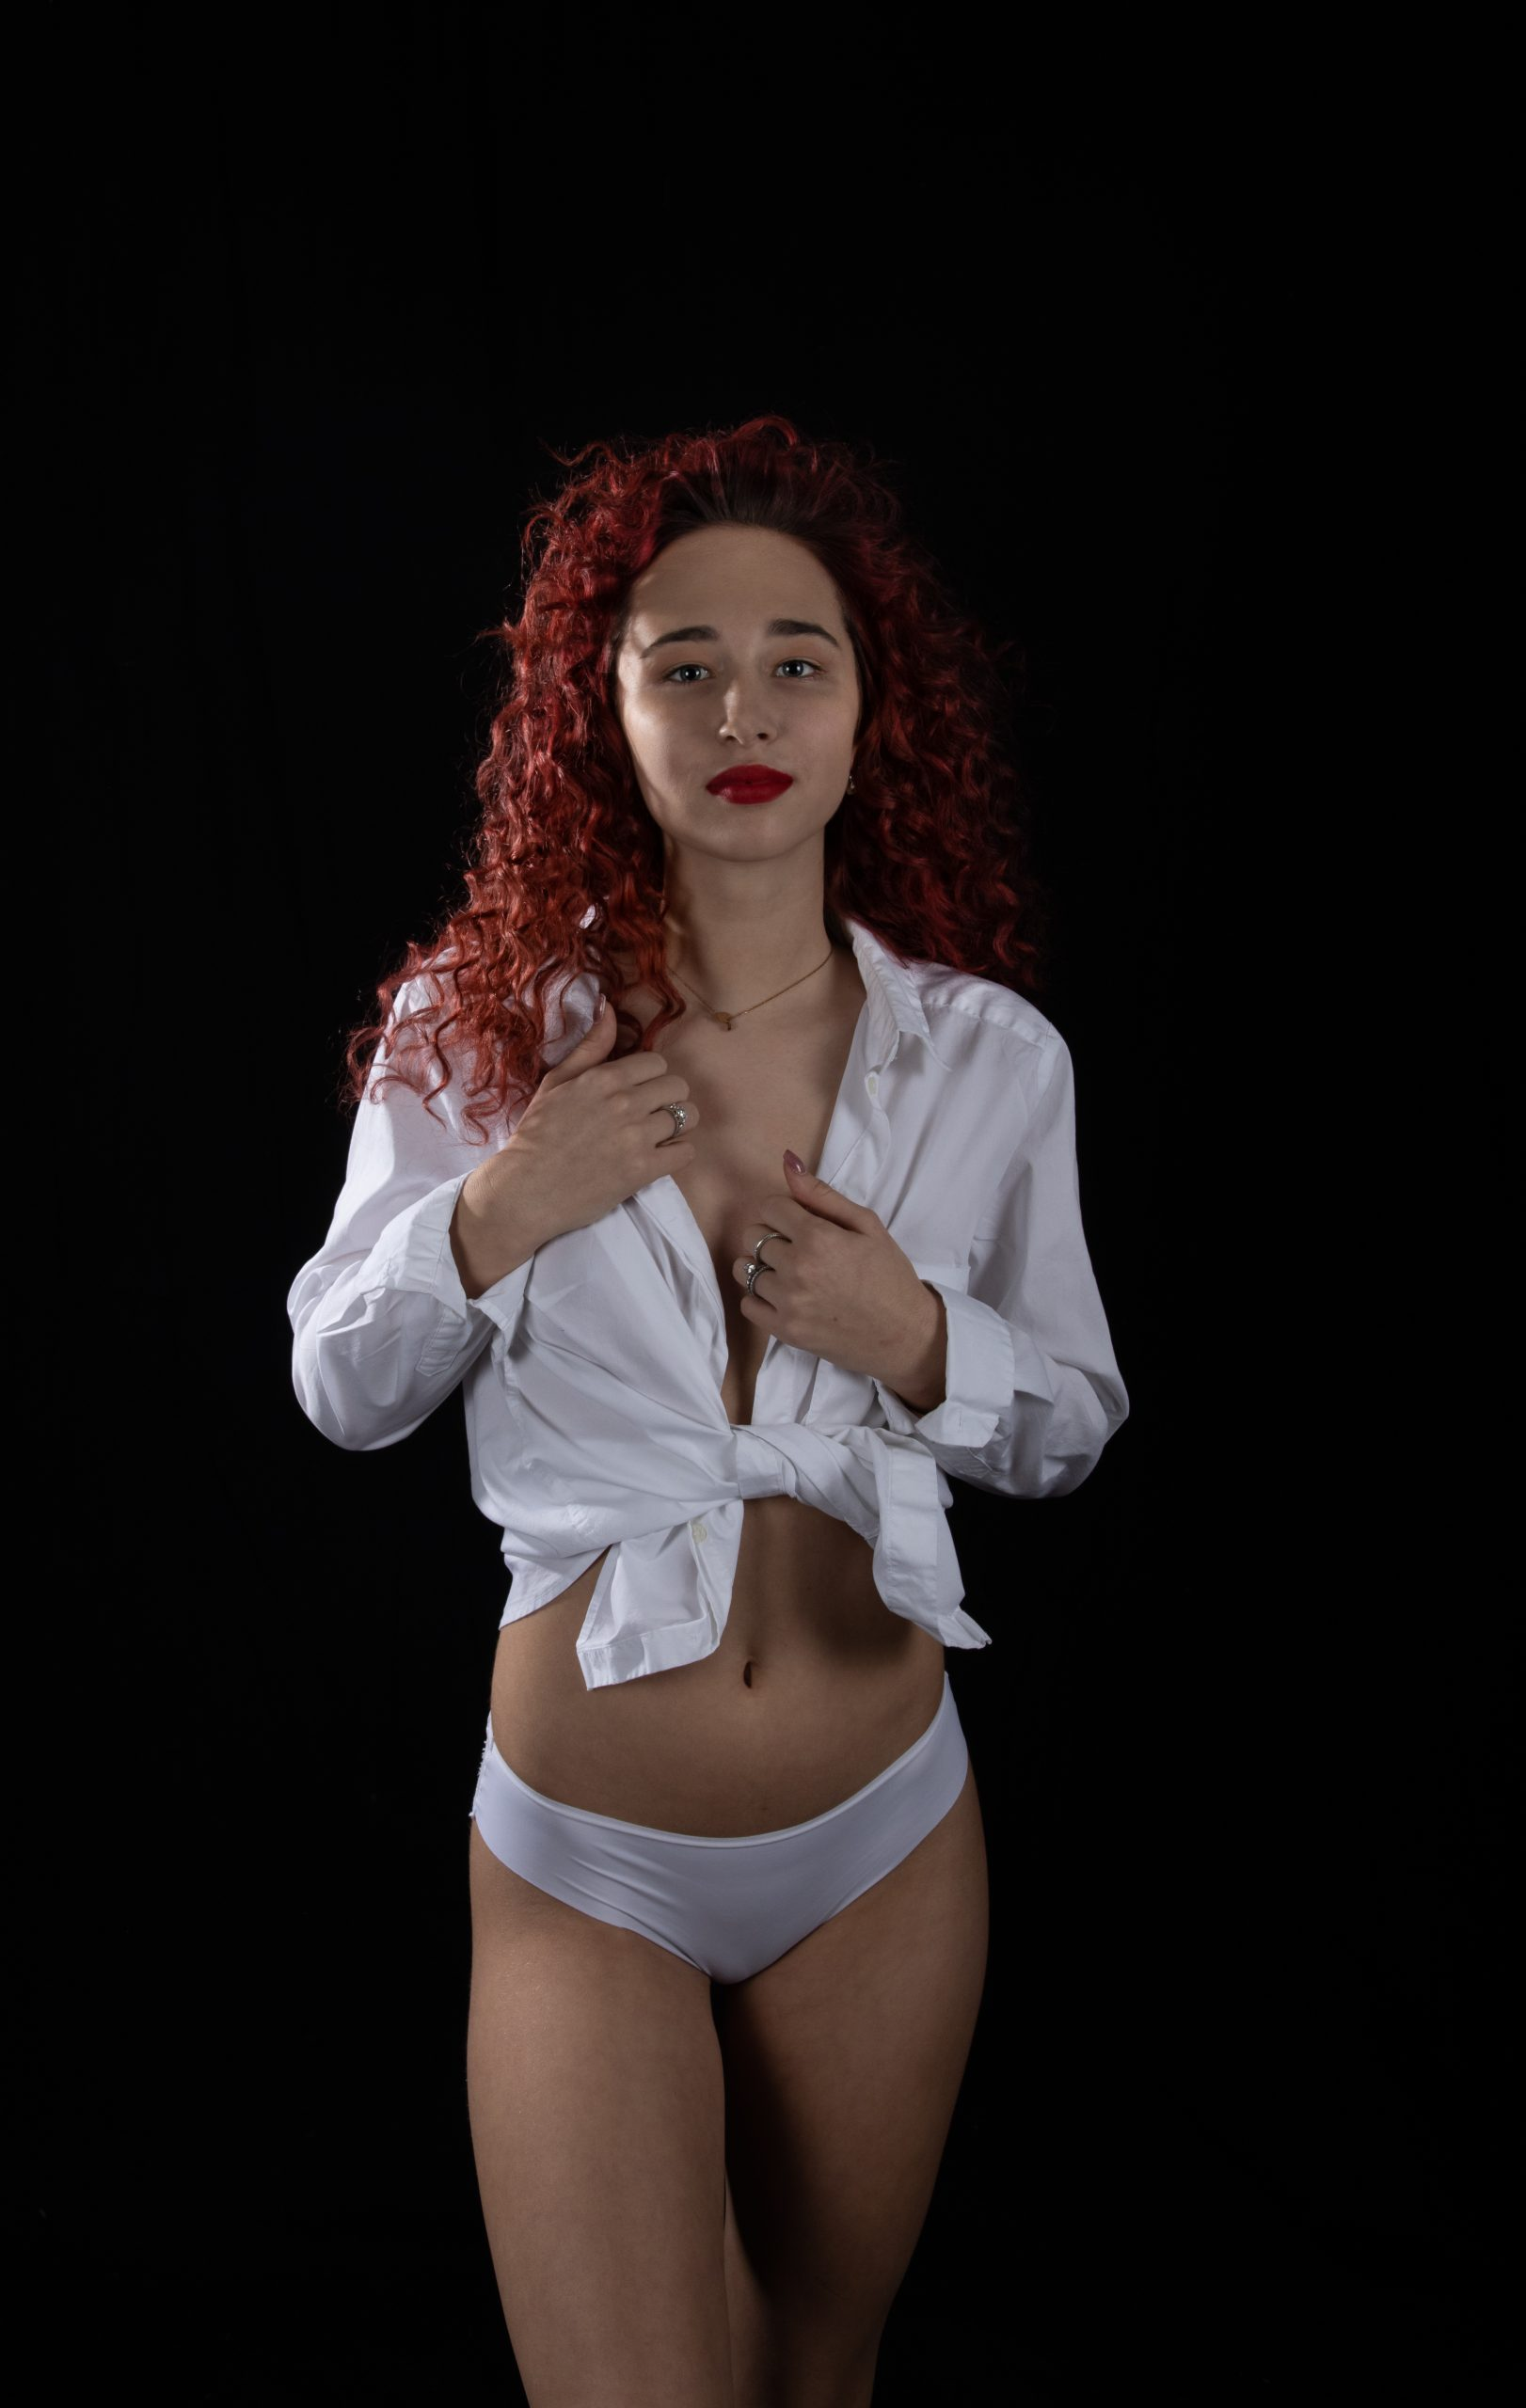 modellen fotografie, Sophiafotografie, boudoirfotografie